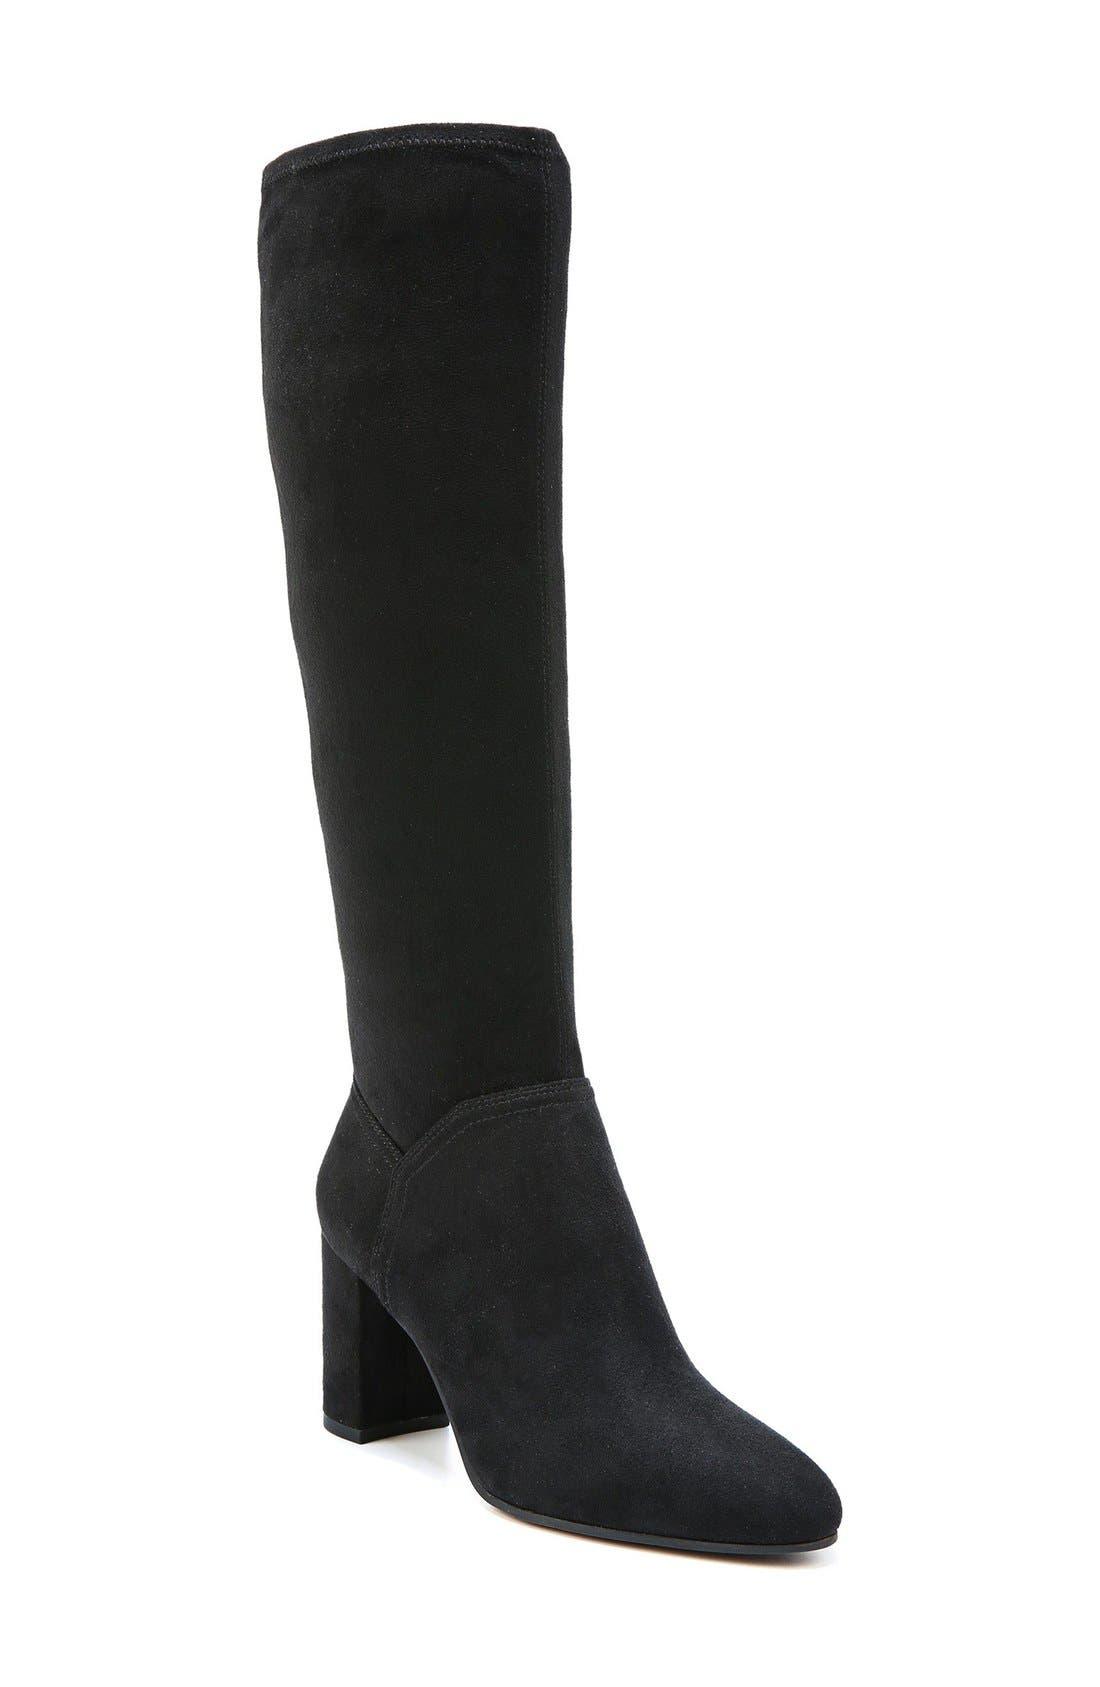 Alternate Image 1 Selected - SARTO by Franco Sarto Effie Knee High Boot (Women)